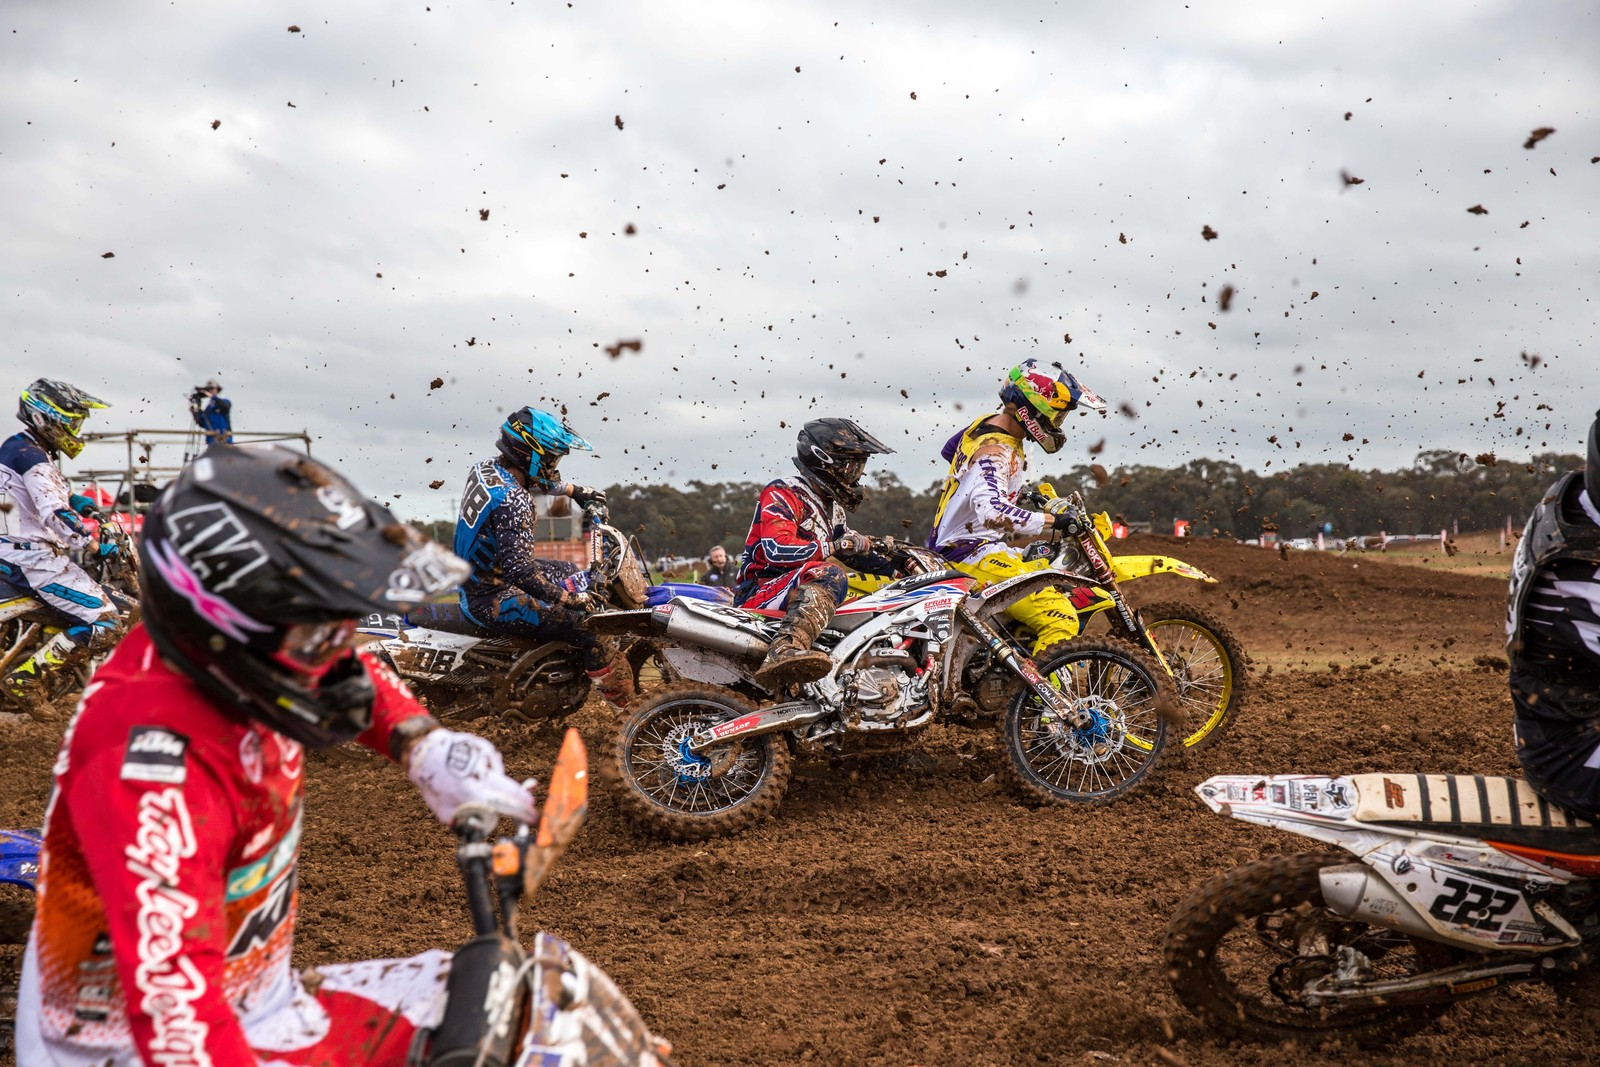 Todd Waters - Australian Motul MX Championships: Round 8, Shepparton - Motocross Pictures - Vital MX